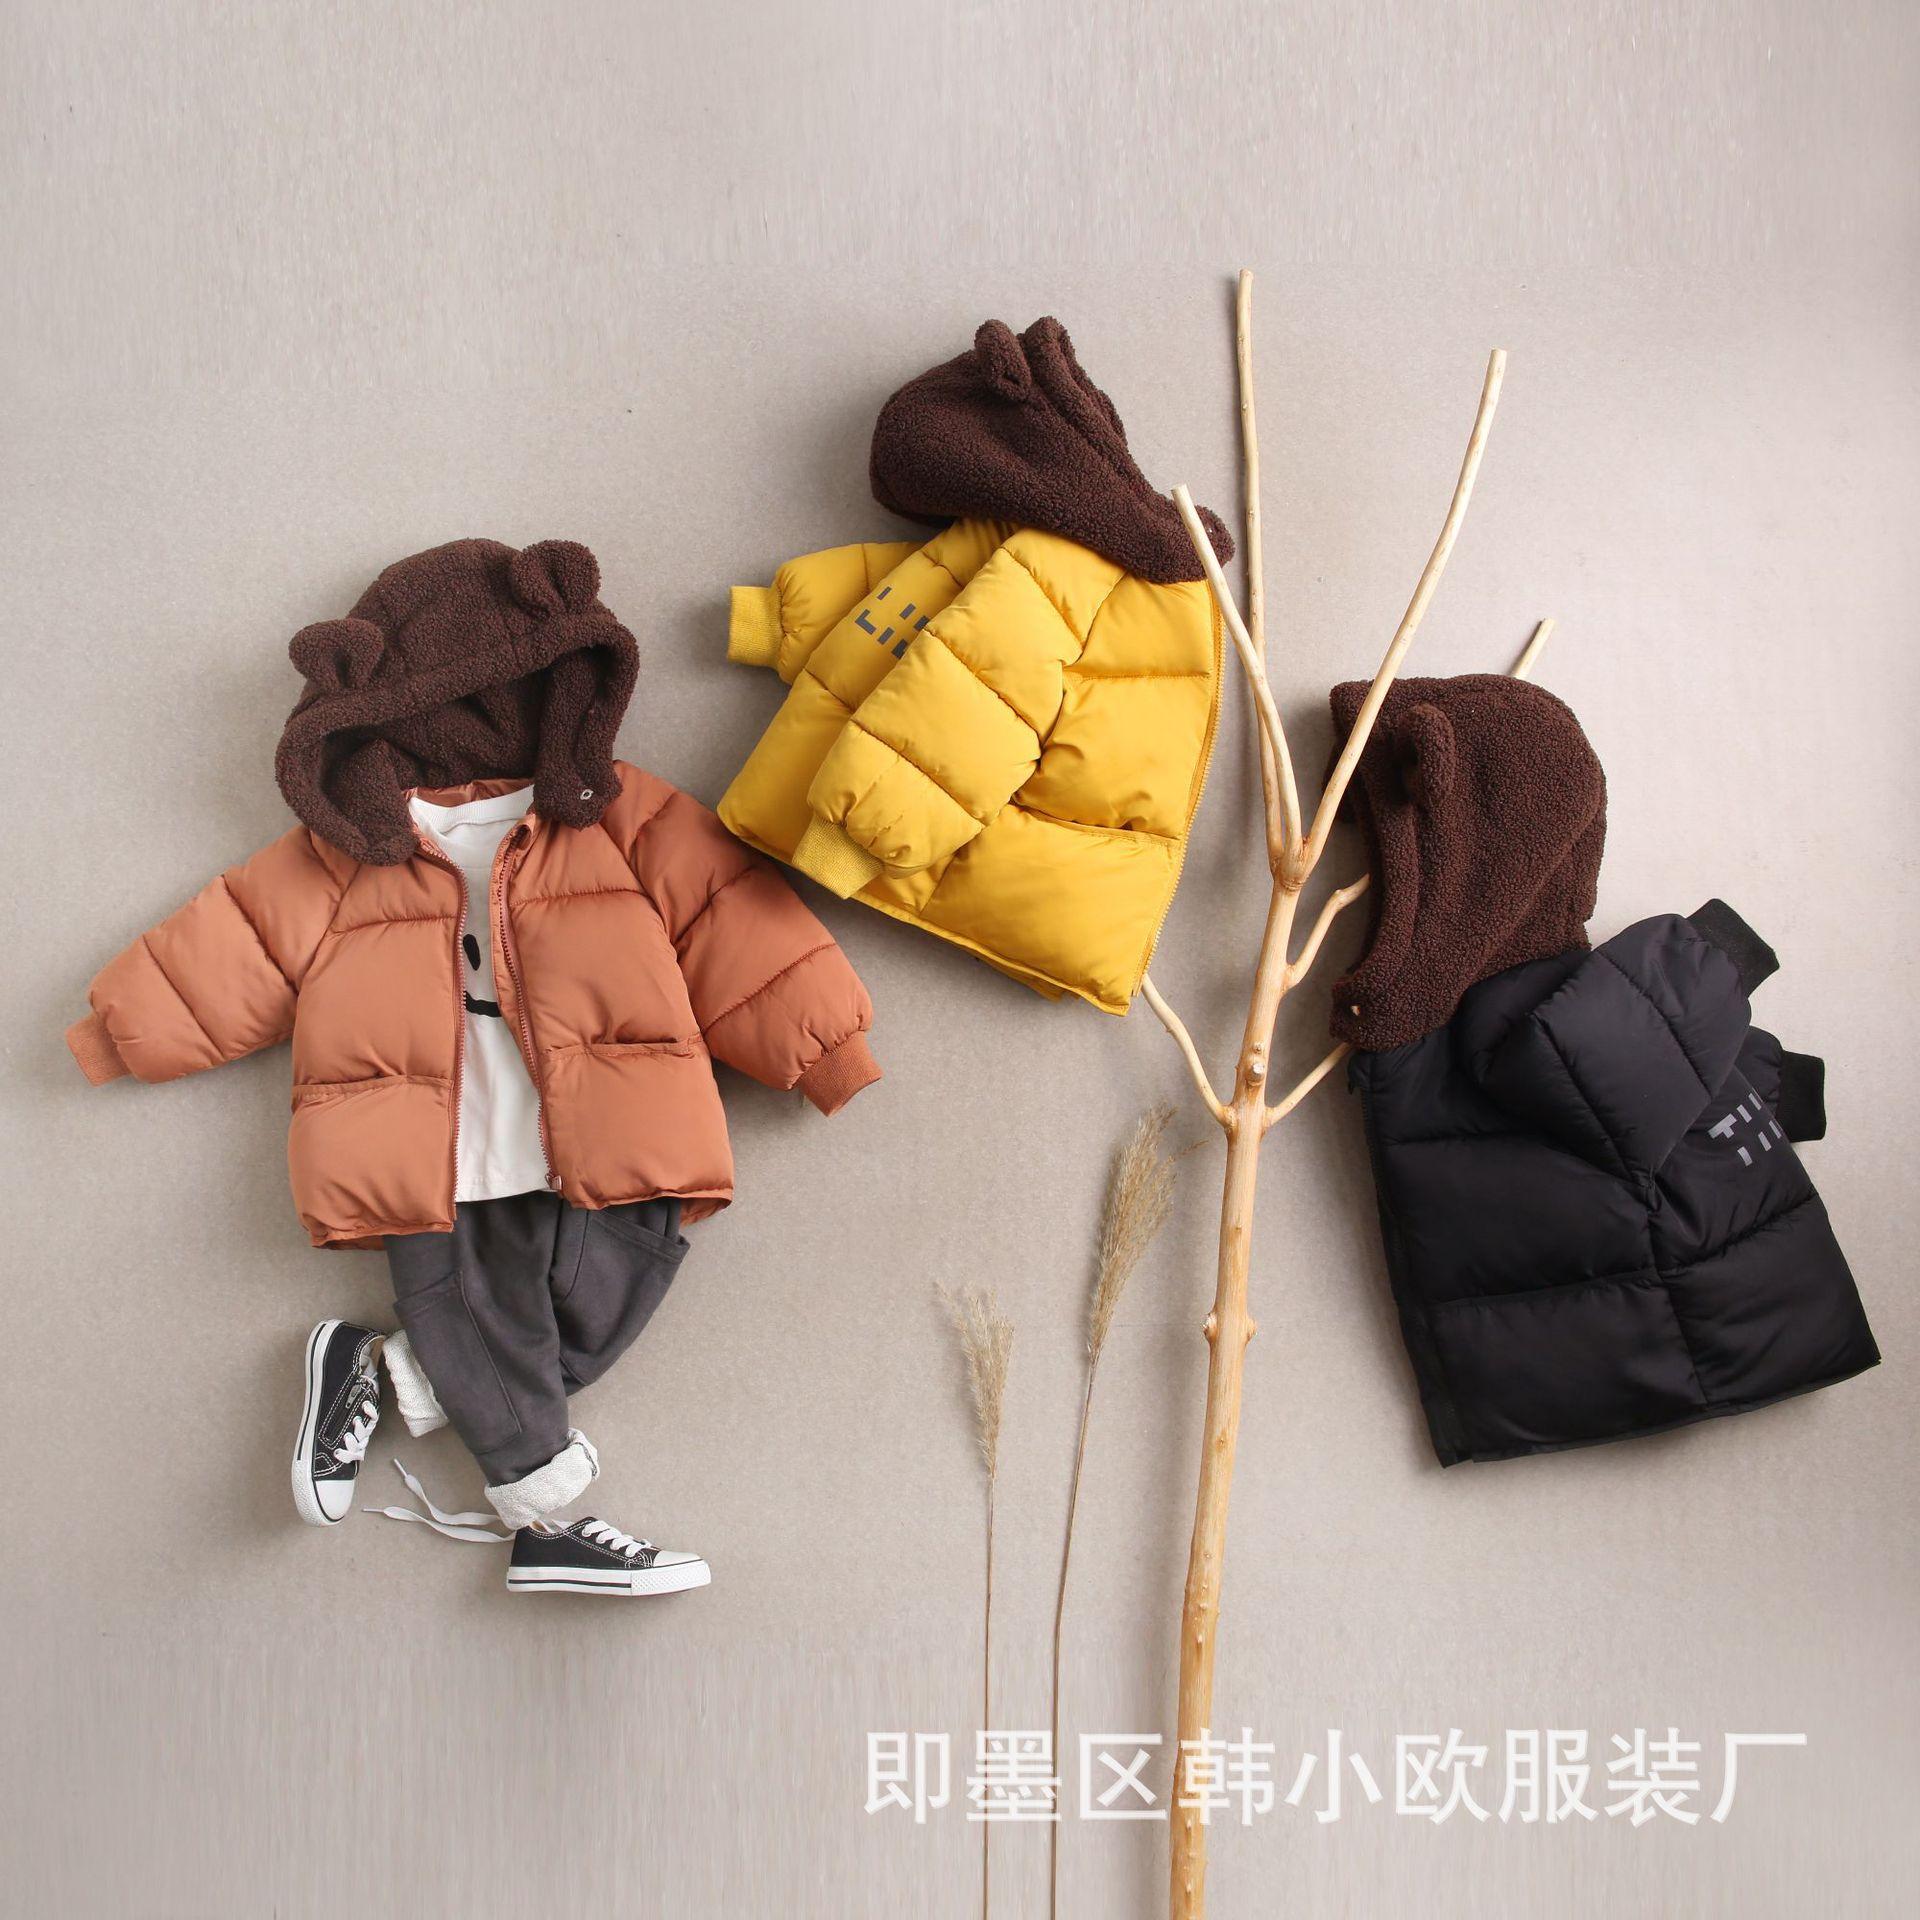 winter new cute hat boys and girls cotton clothing children girls winter coat  boy winter jacket coat